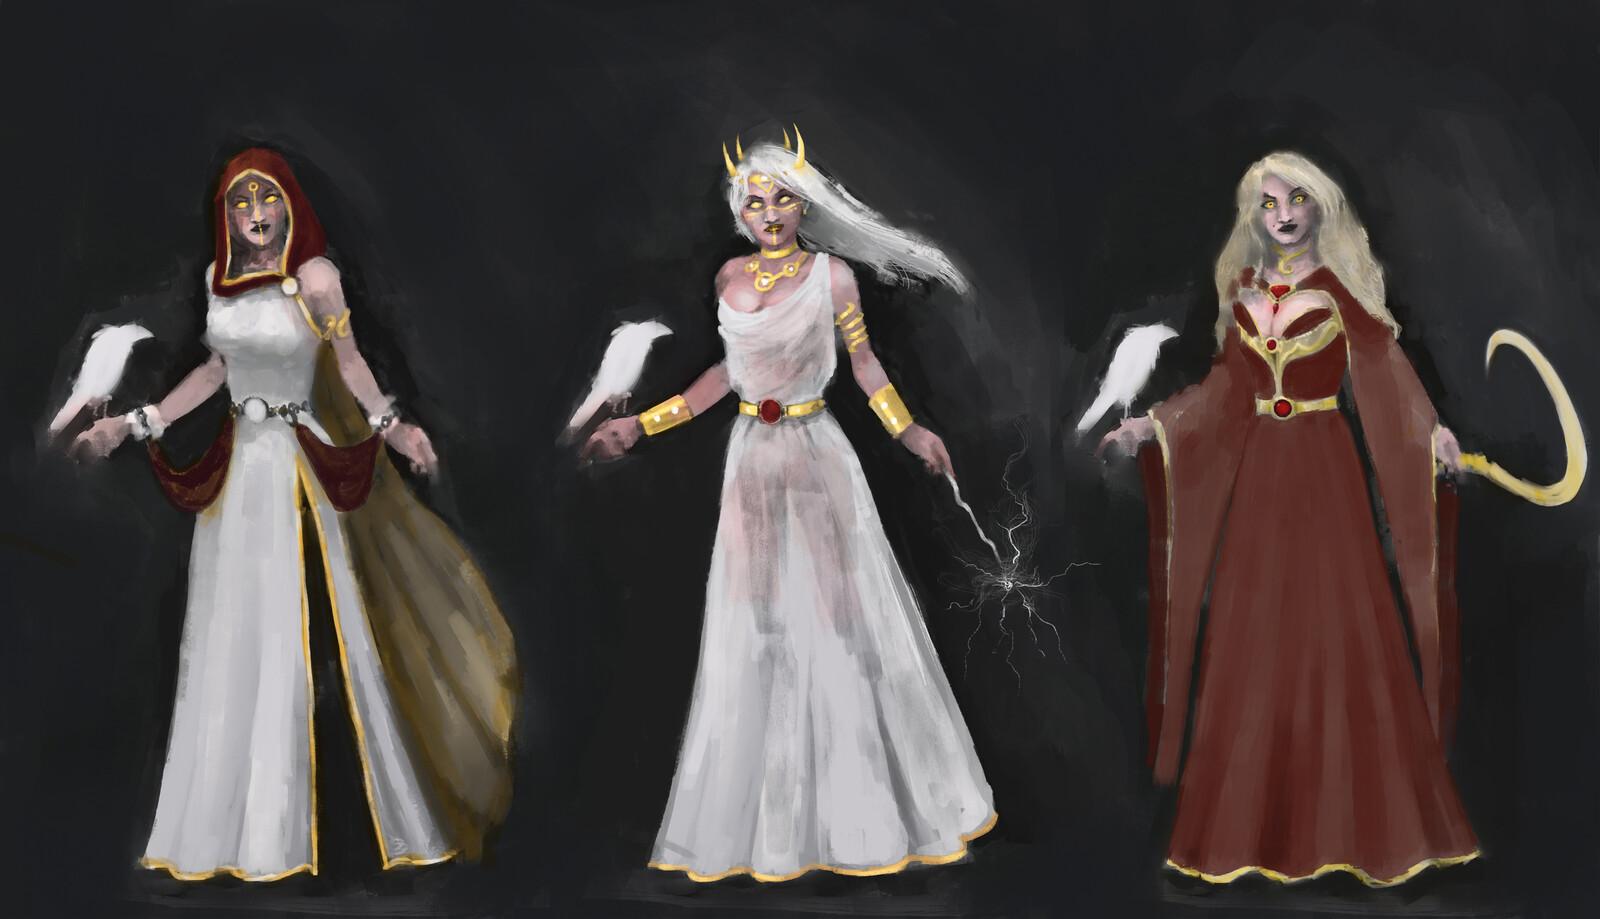 Necromant Snow White - Character Design